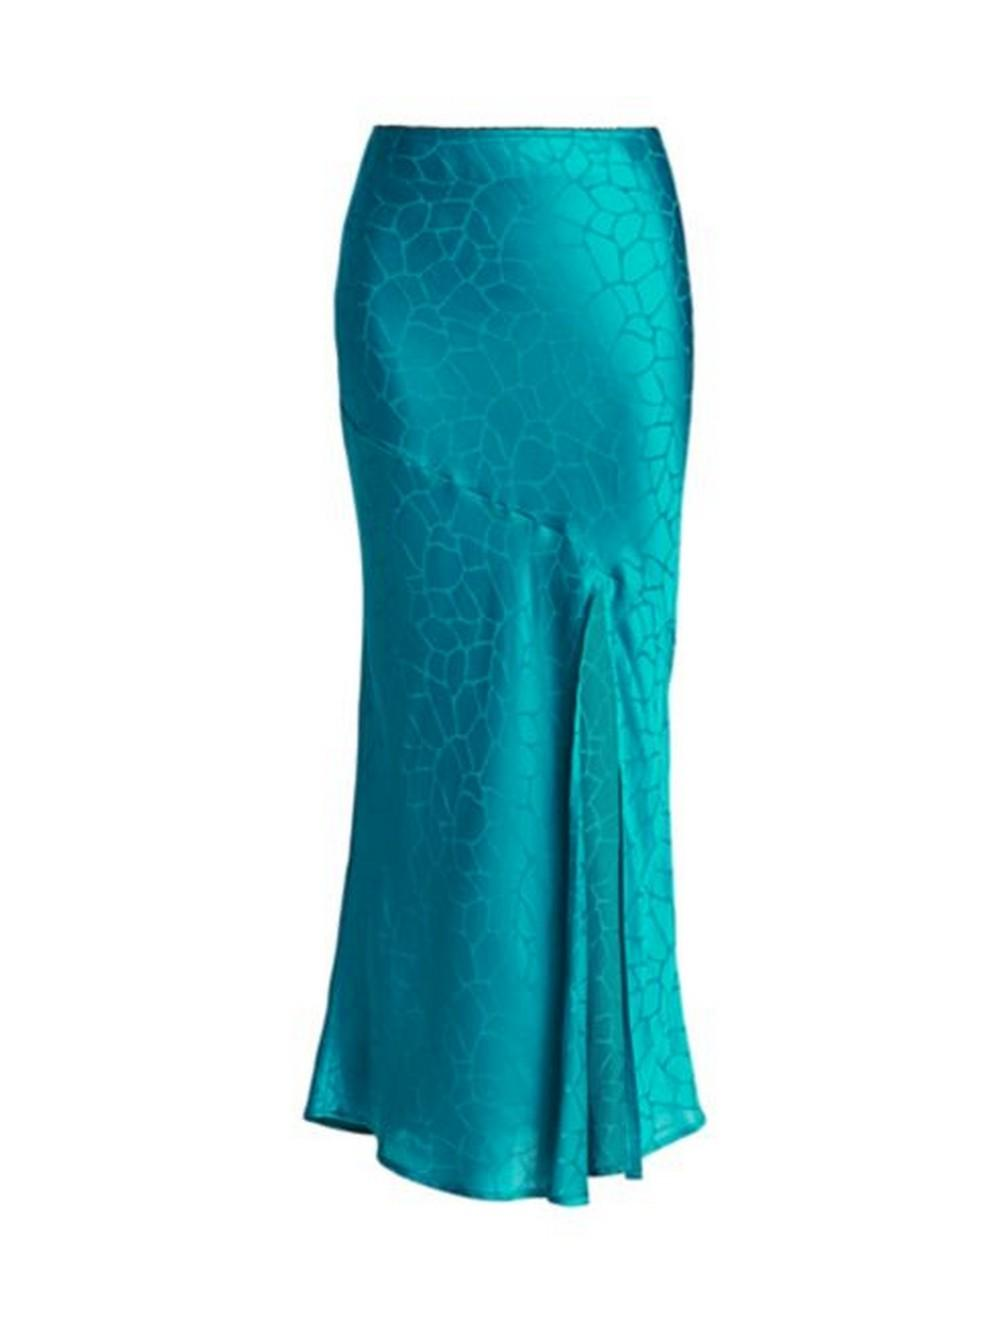 Eve Giraffe Print Midi Skirt Item # L02G549